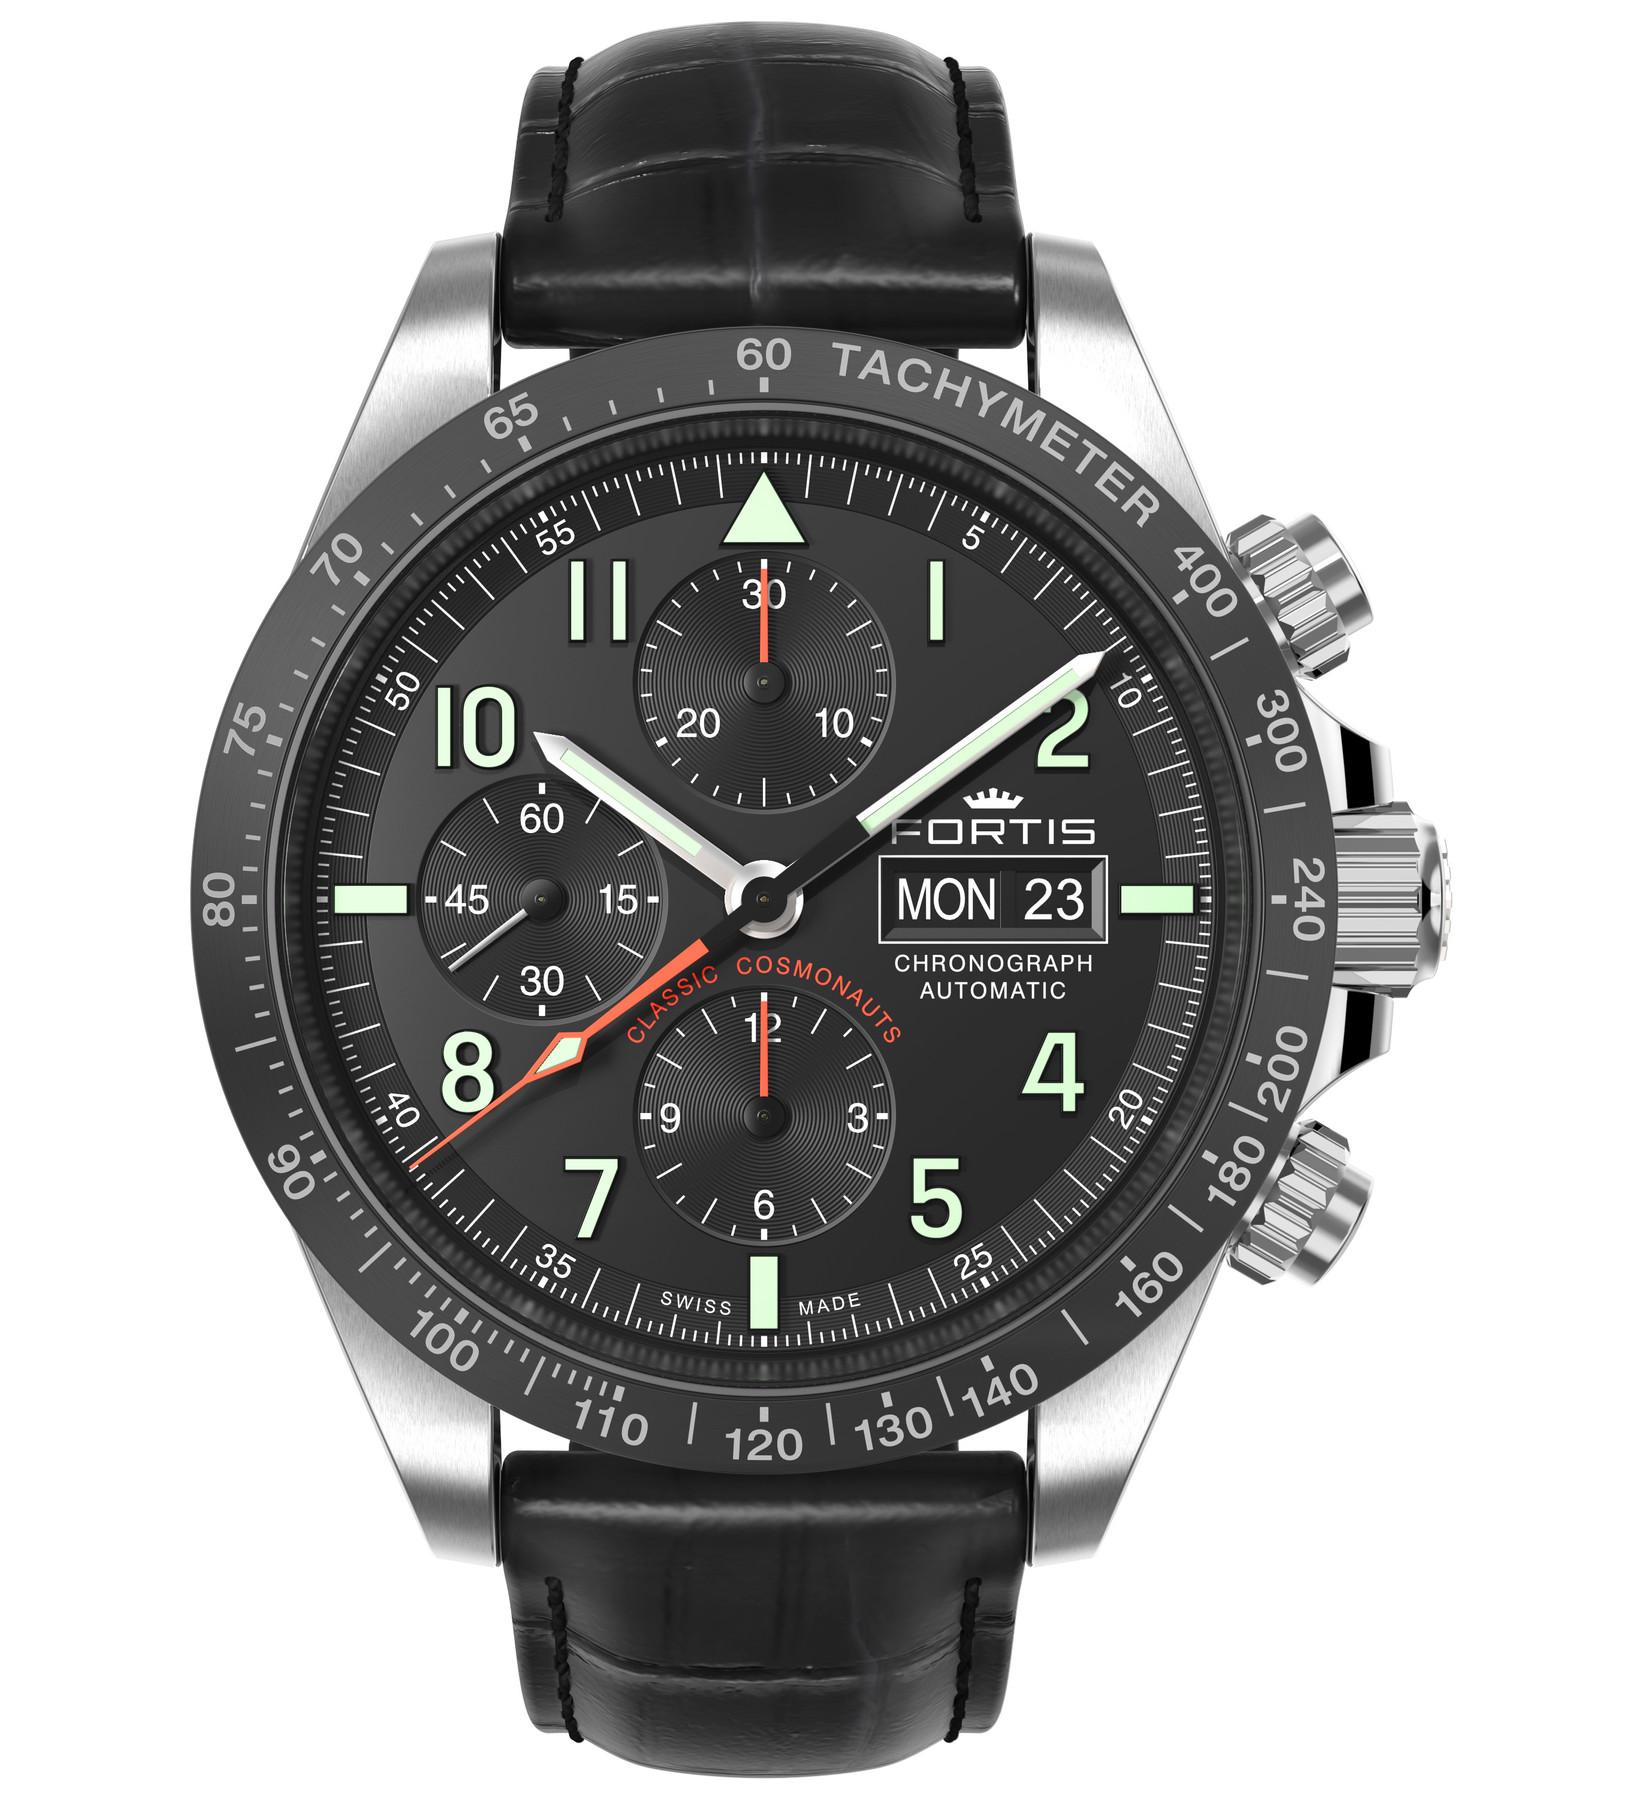 Fortis 401.26.11 L01 Classic Cosmonauts Automatik Chronograph